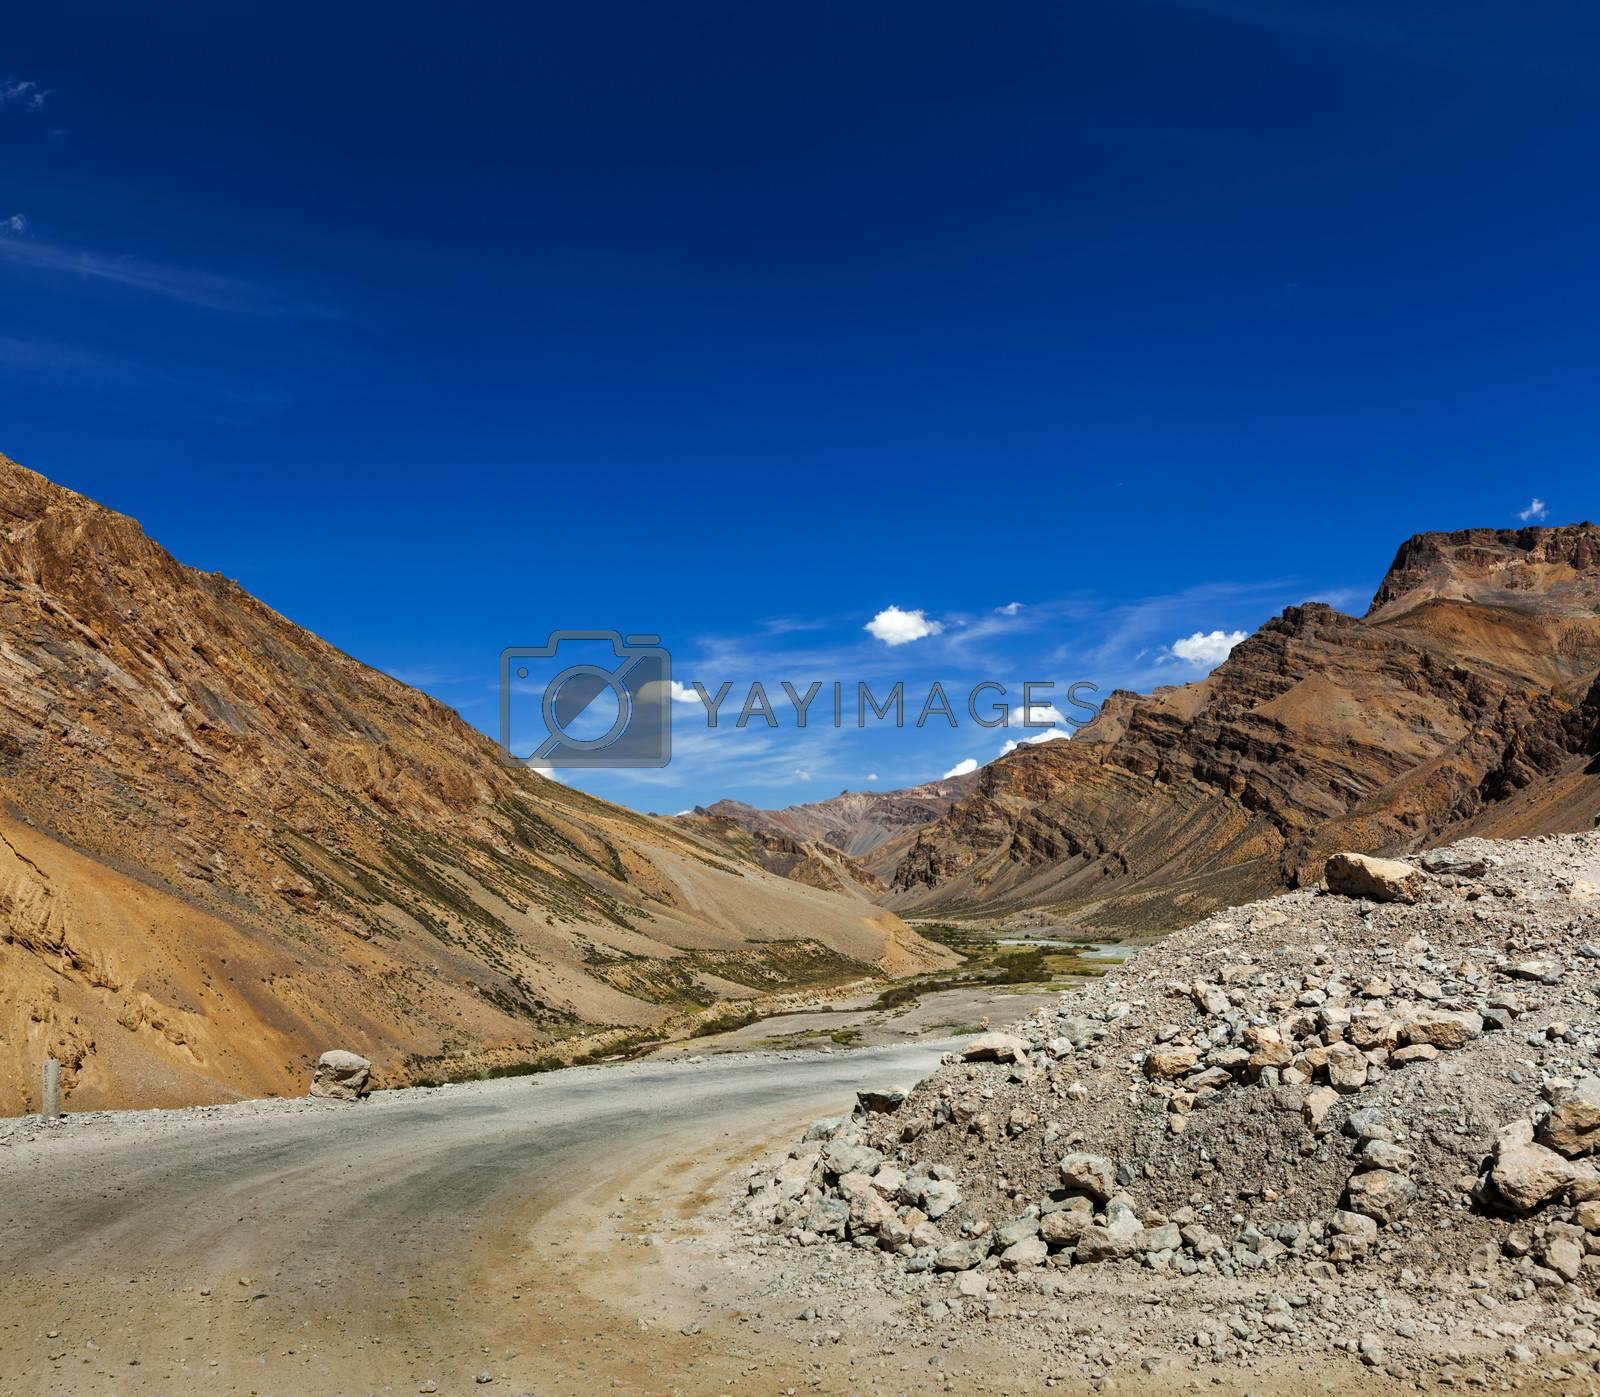 Royalty free image of Manali-Leh road by dimol